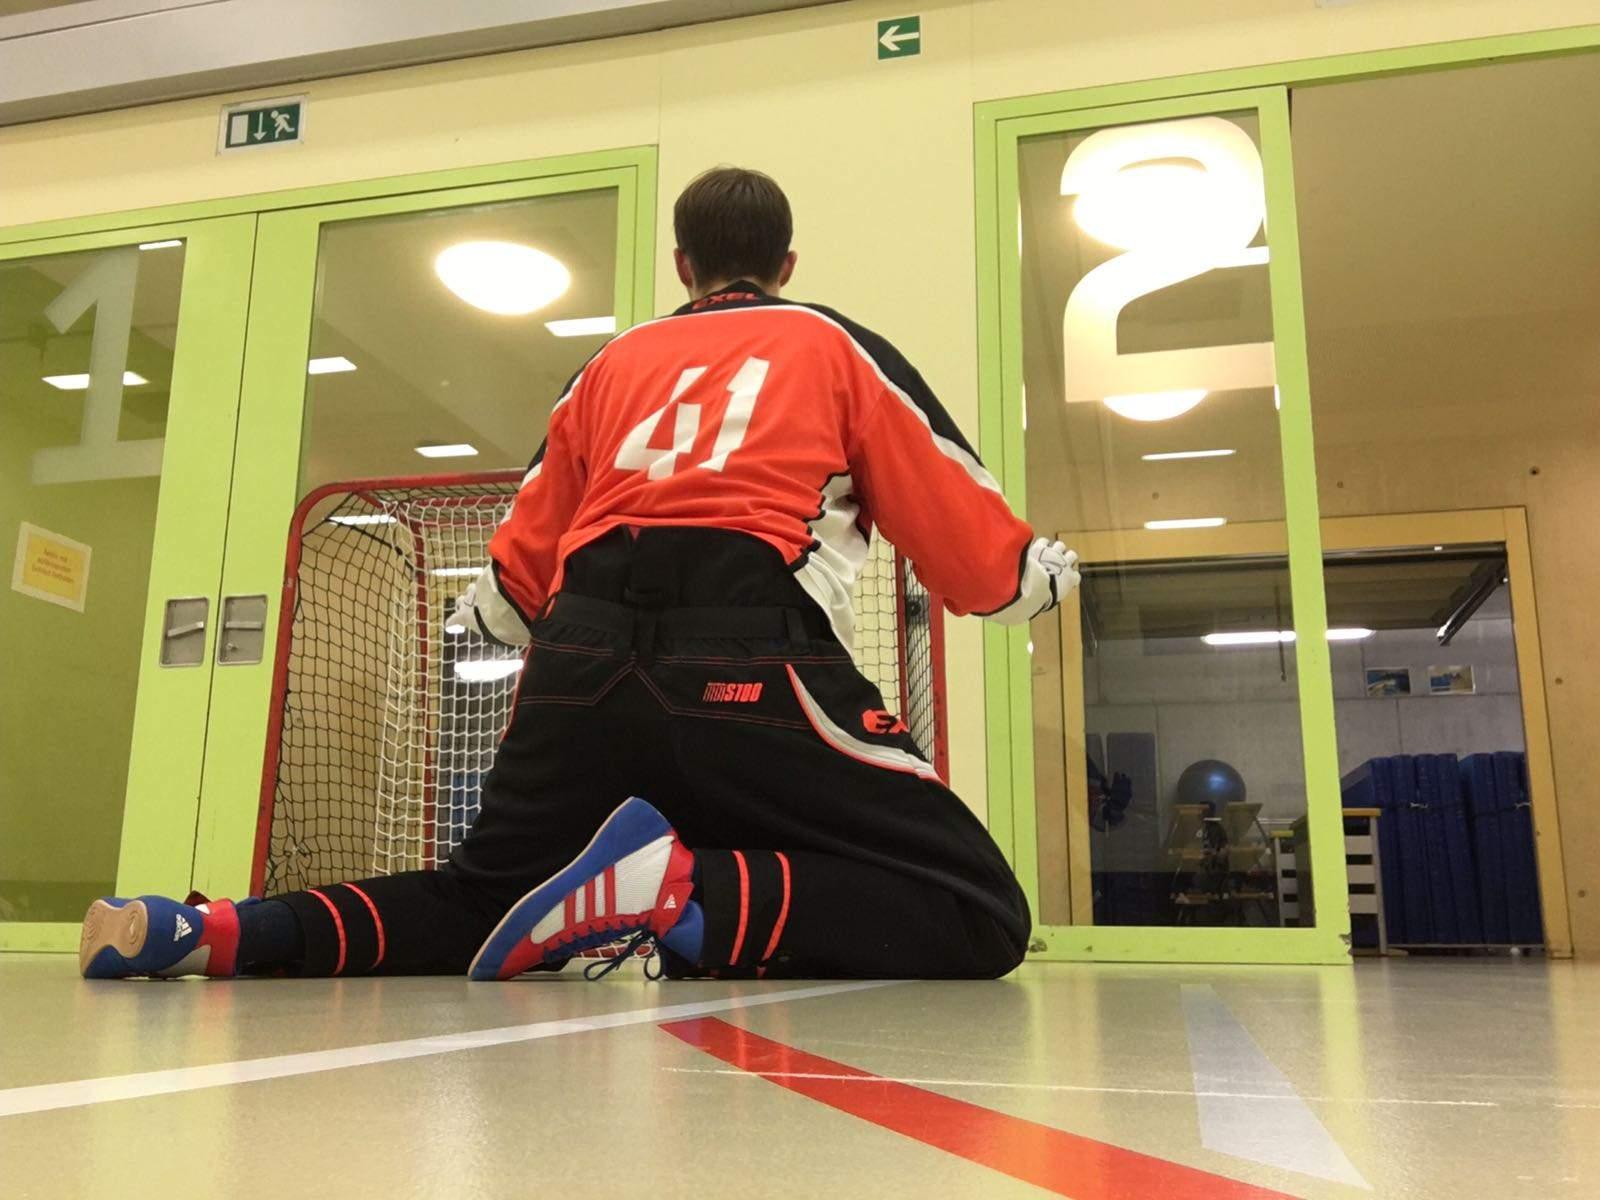 Floorball Goalie Closed Legs Back